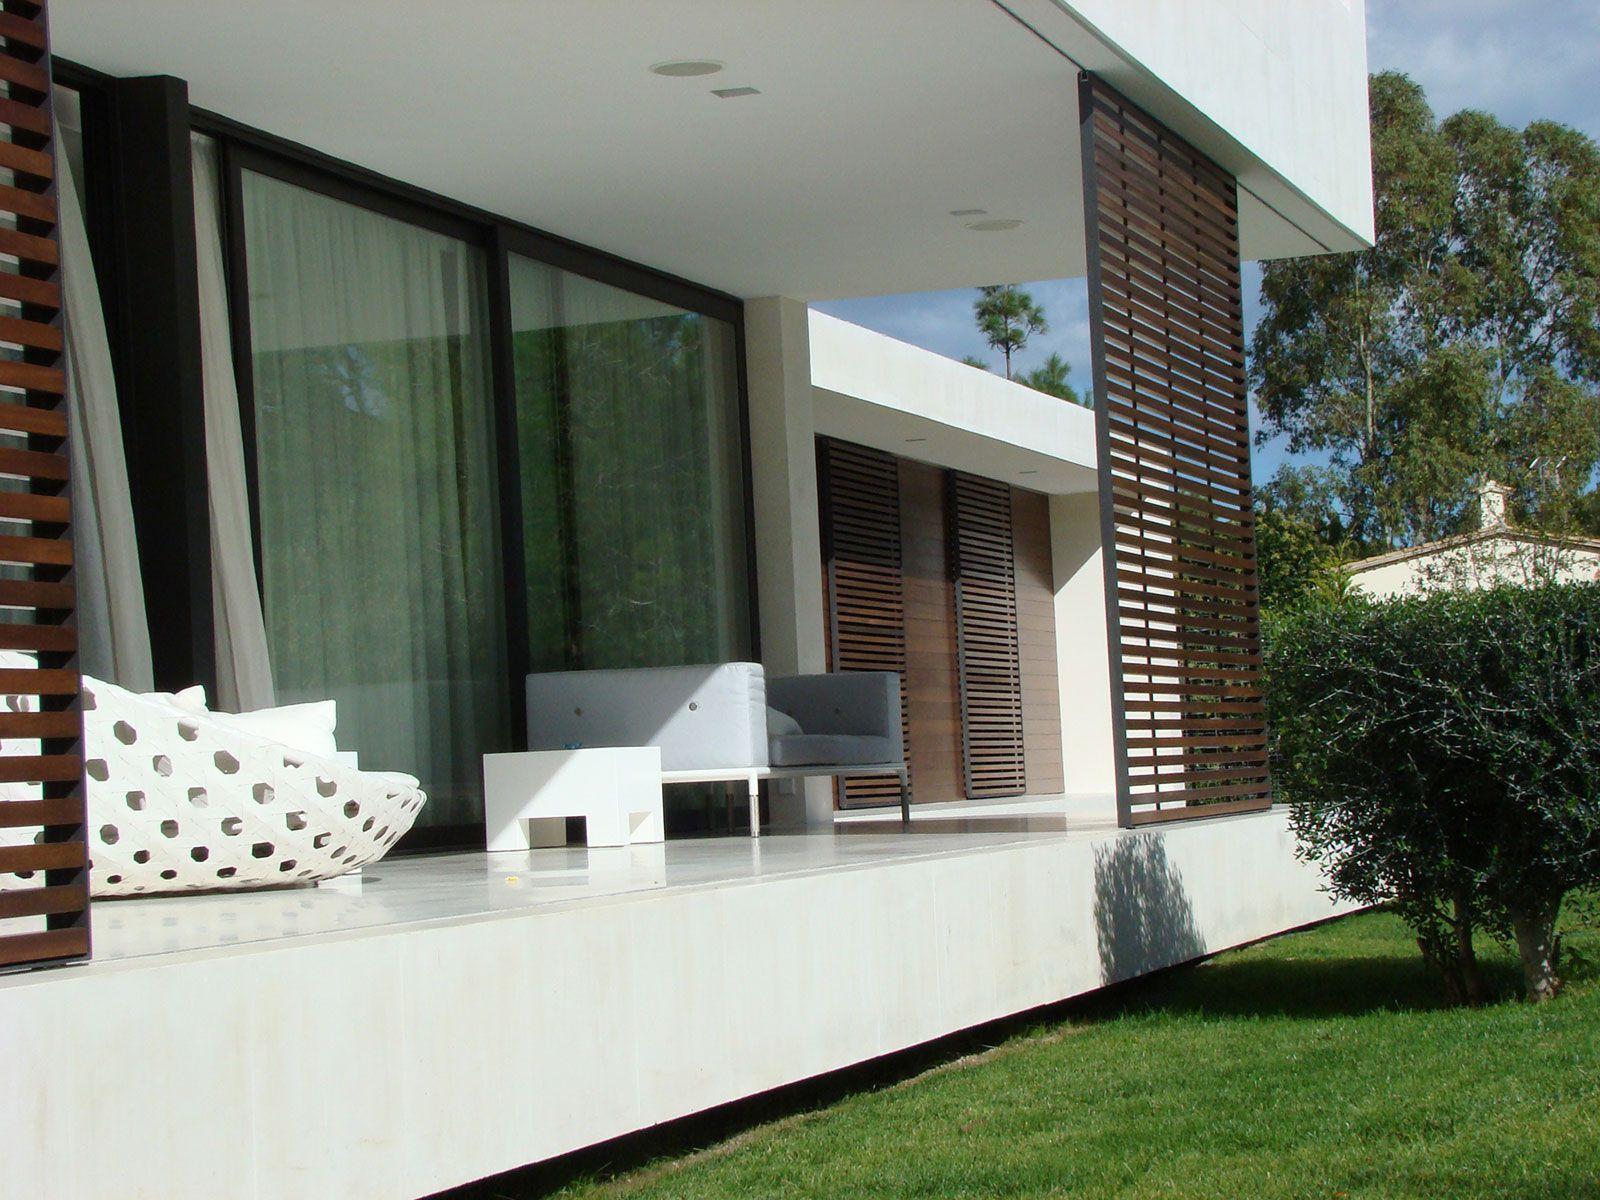 Casa-Bauzà-03-1